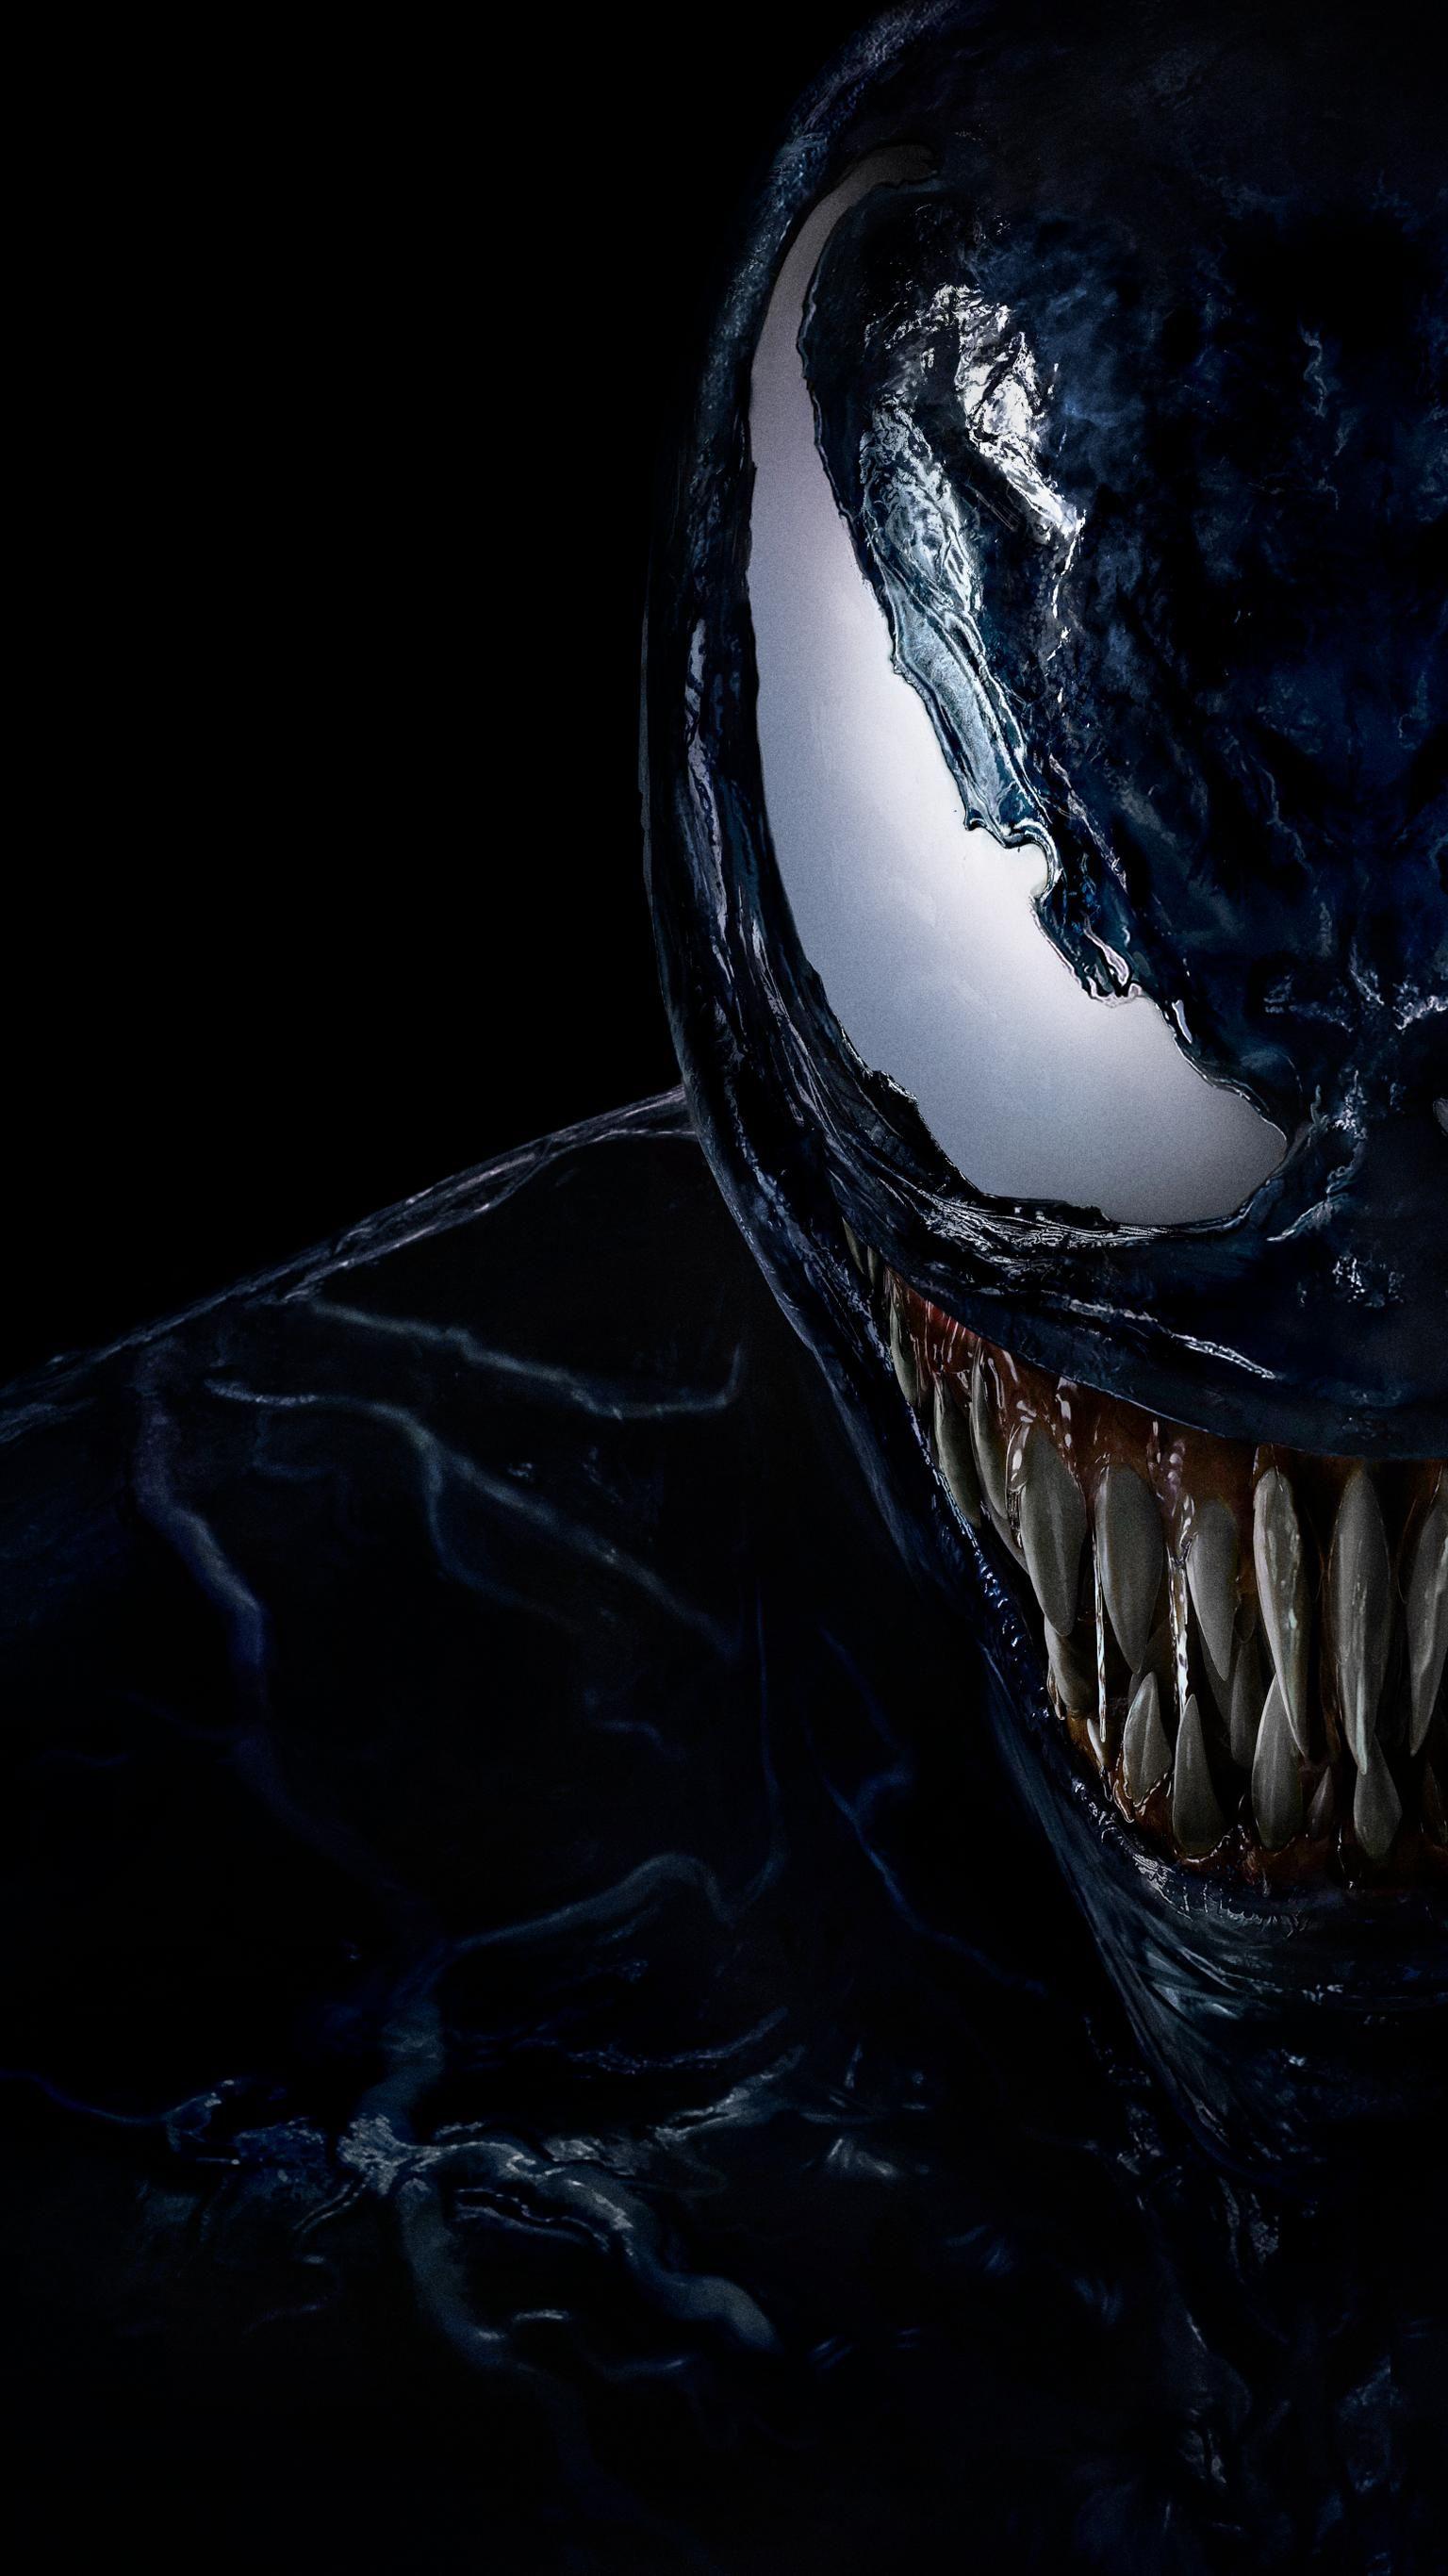 Venom (2018) Phone Wallpaper | Luciano | Venom movie, Marvel venom